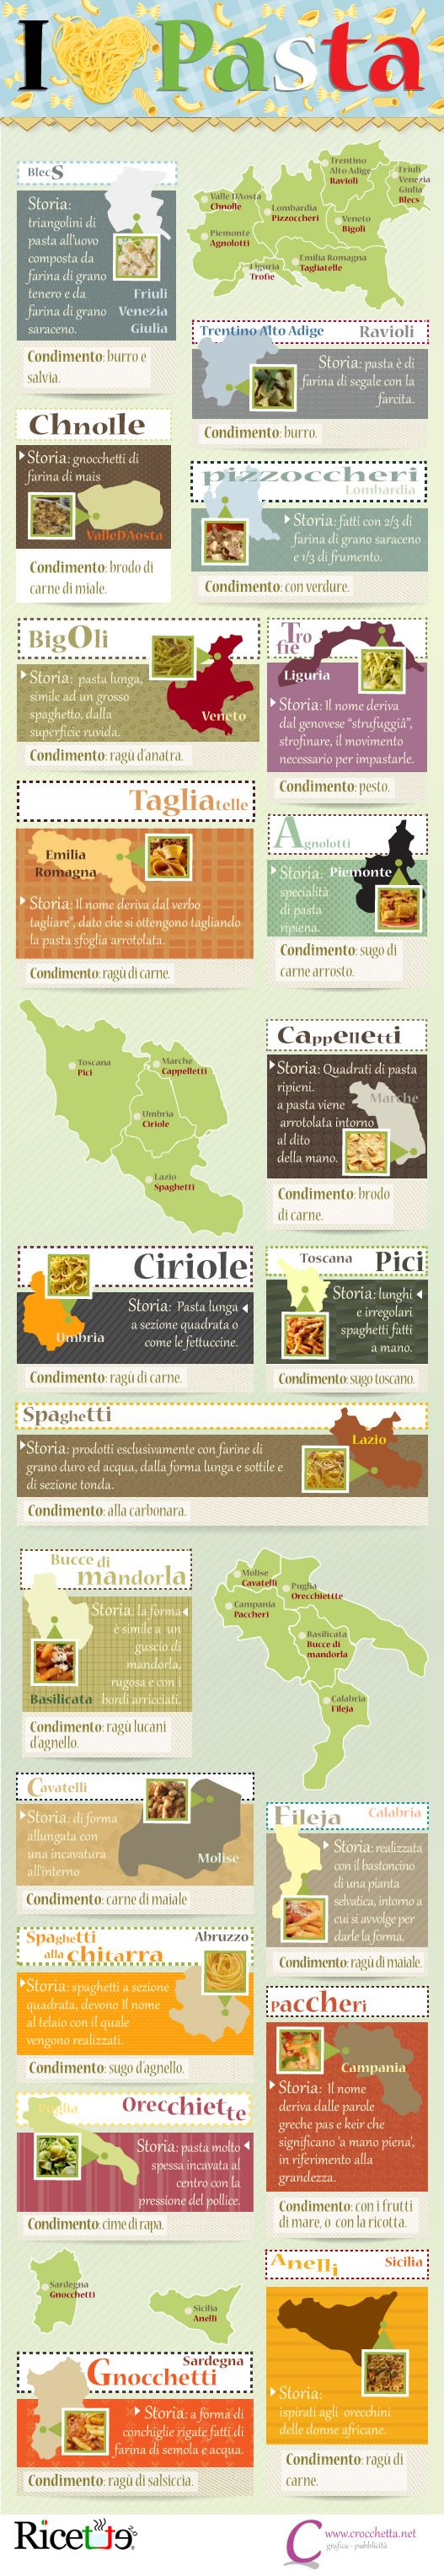 http://www.ricette20.it/wp-content/uploads/2012/11/da-che-pasta-vieni-crocchetta.jpg